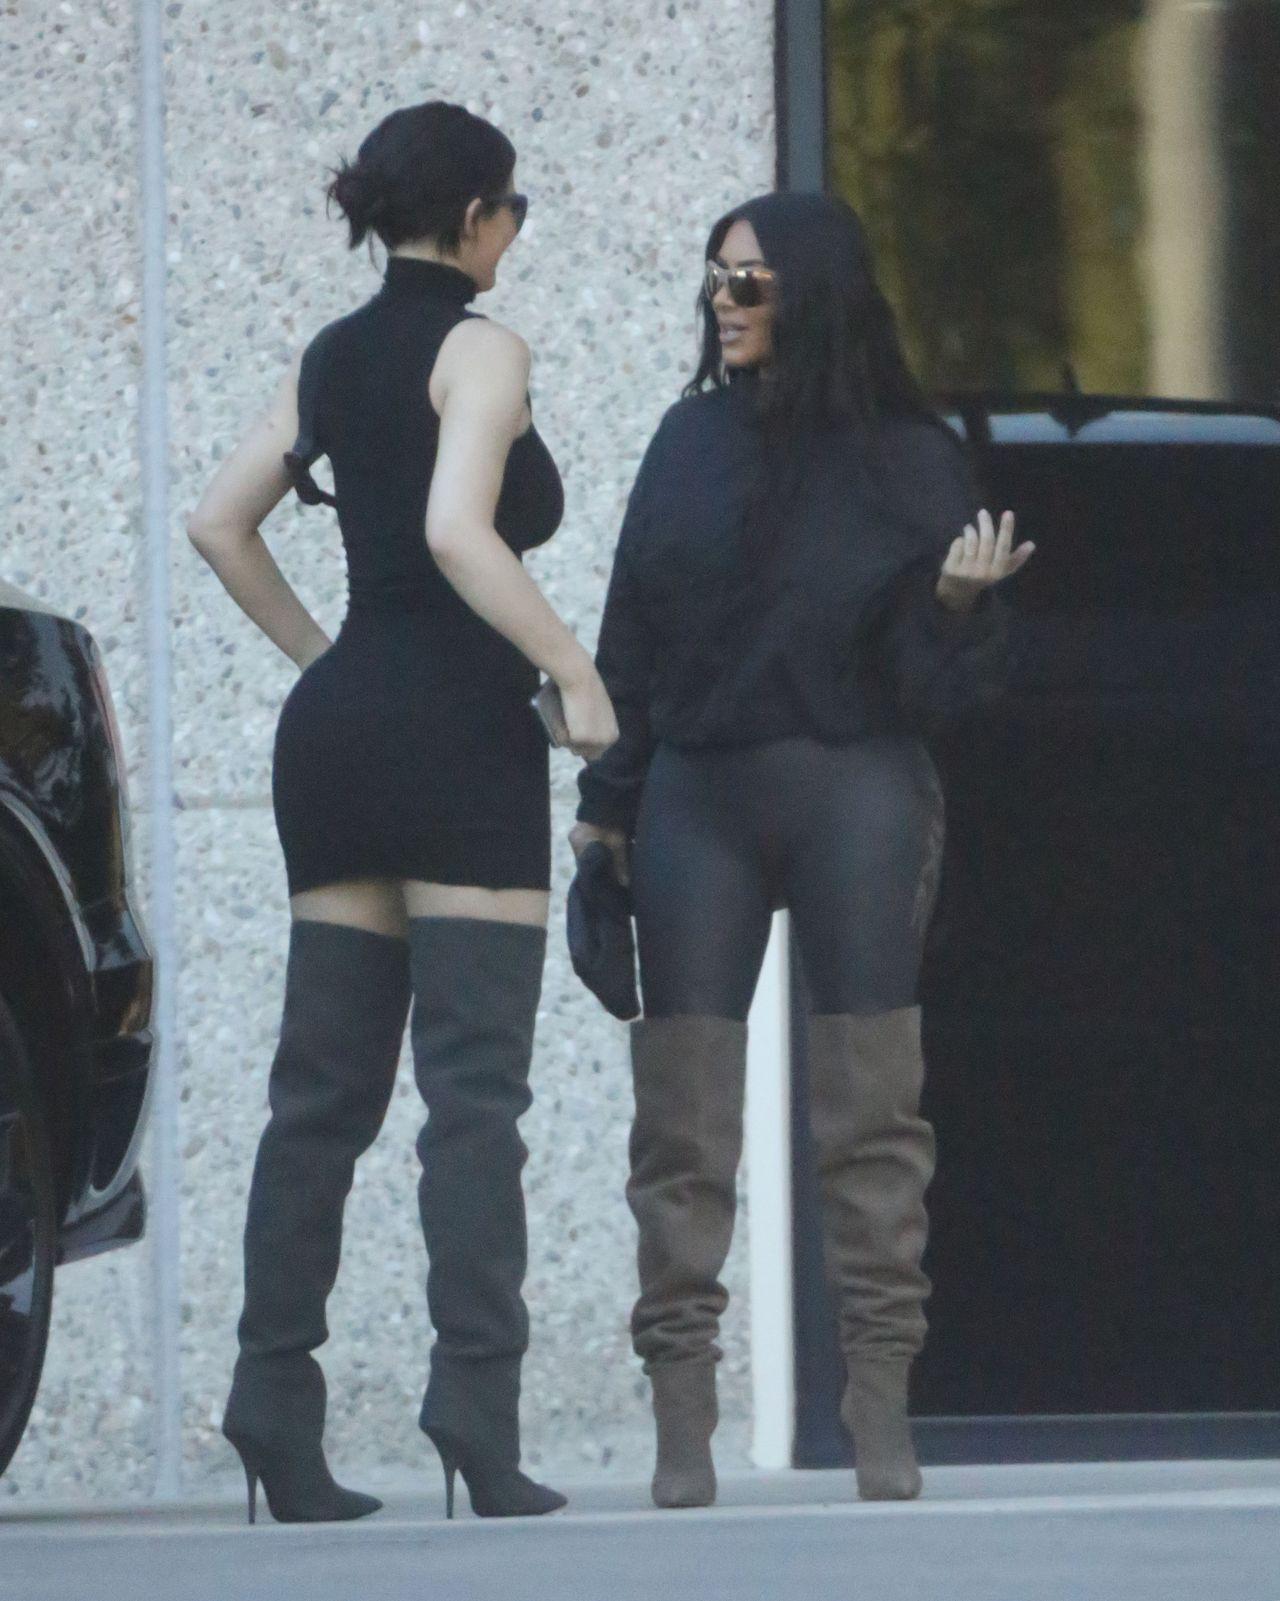 Rozkraczona Kim Kardashian siedzi na kuchennym blacie (Instagram)